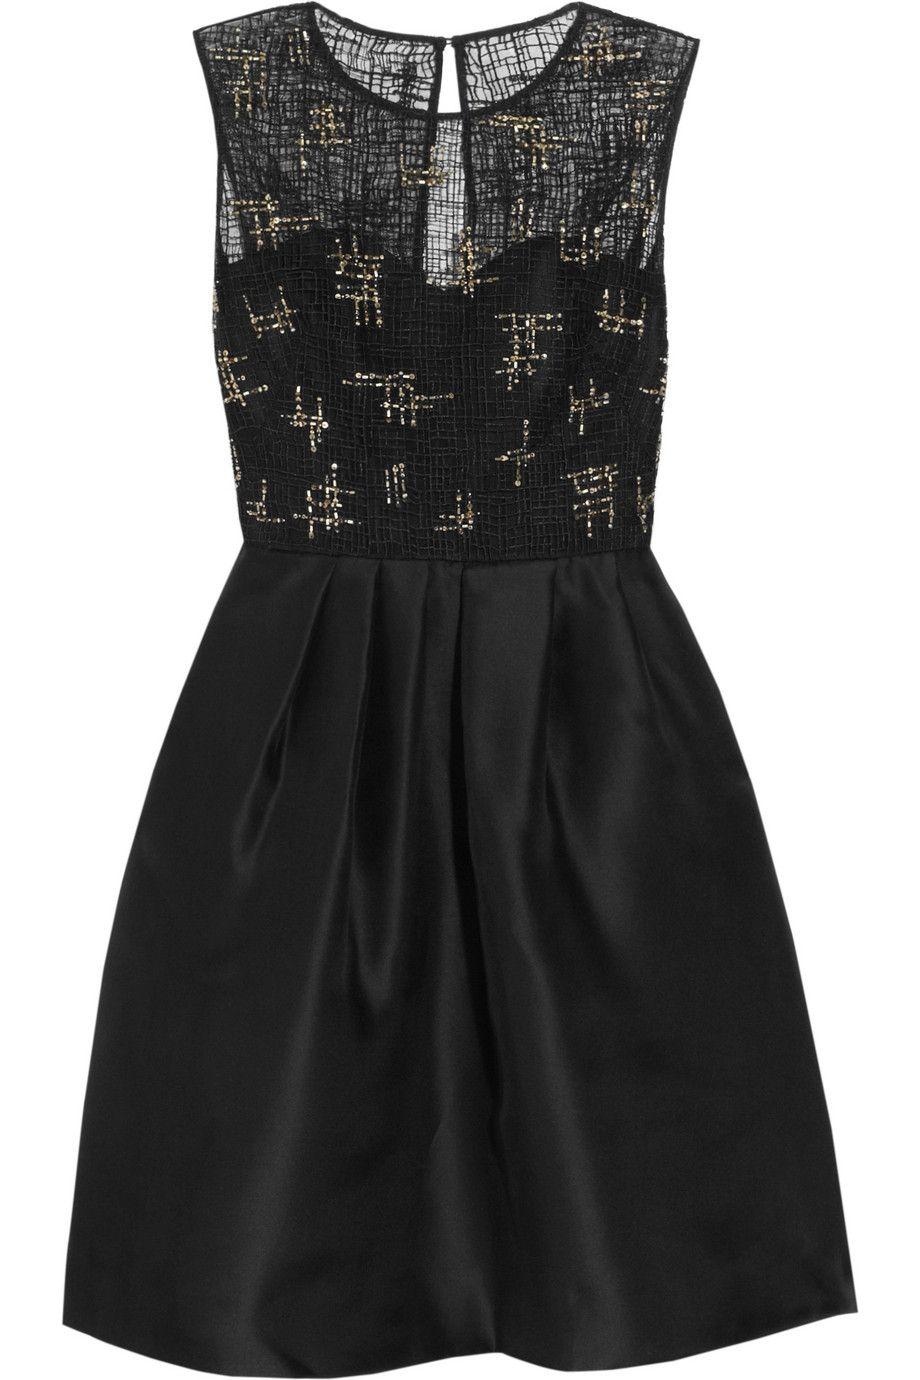 Lela Rose  Beaded lace and organza dress  NETAPORTER